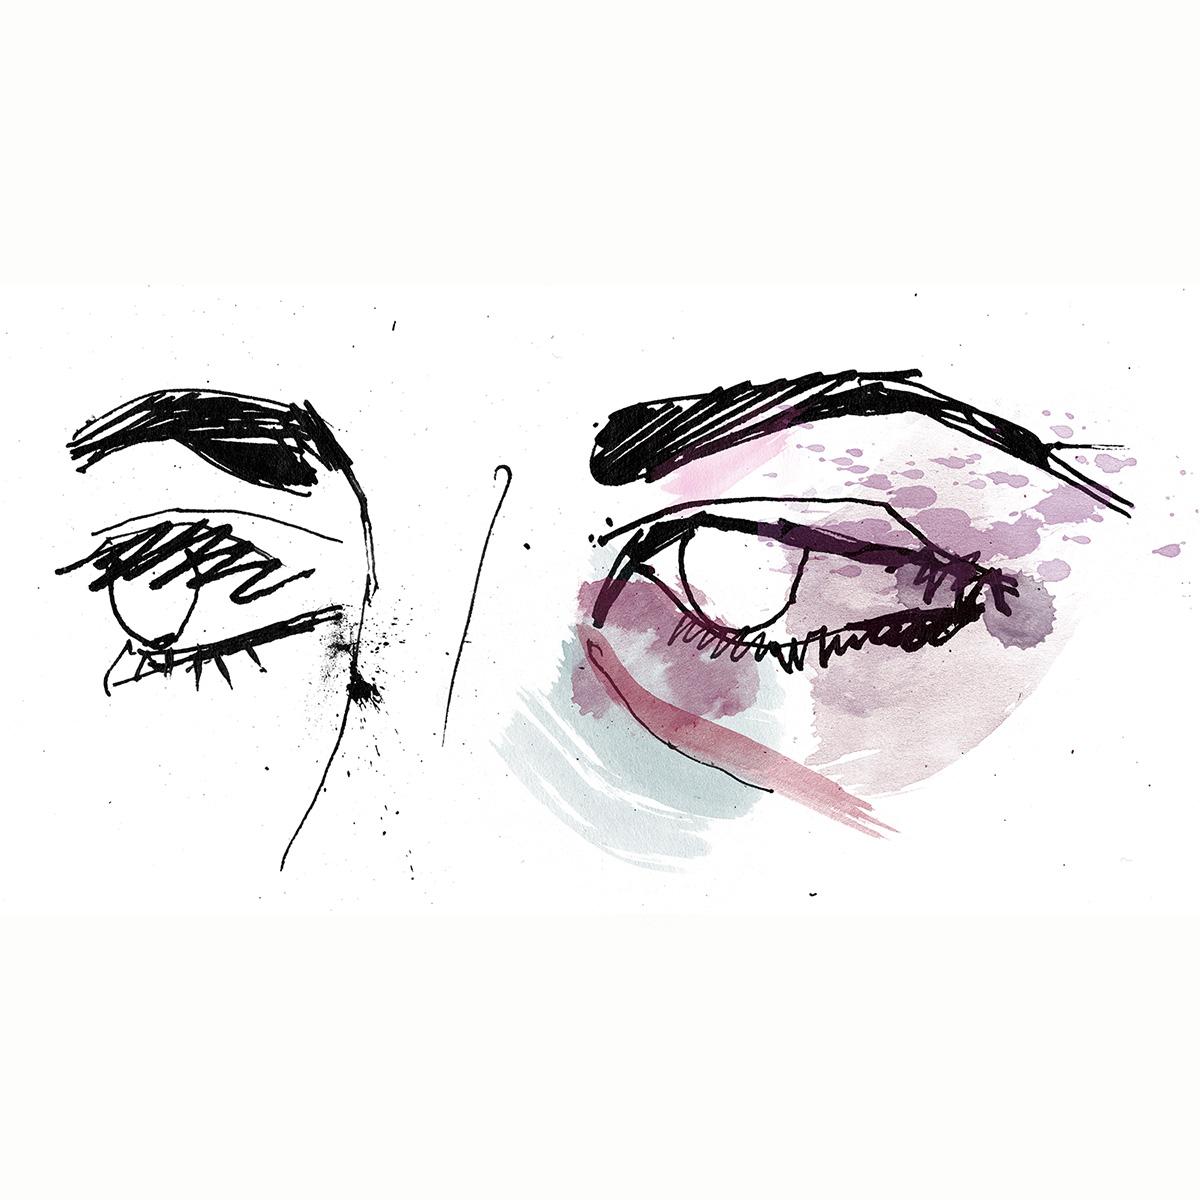 Black eye, fight, women illustration, ink drawing, hand drawn artwork by Ben Tallon illustrator